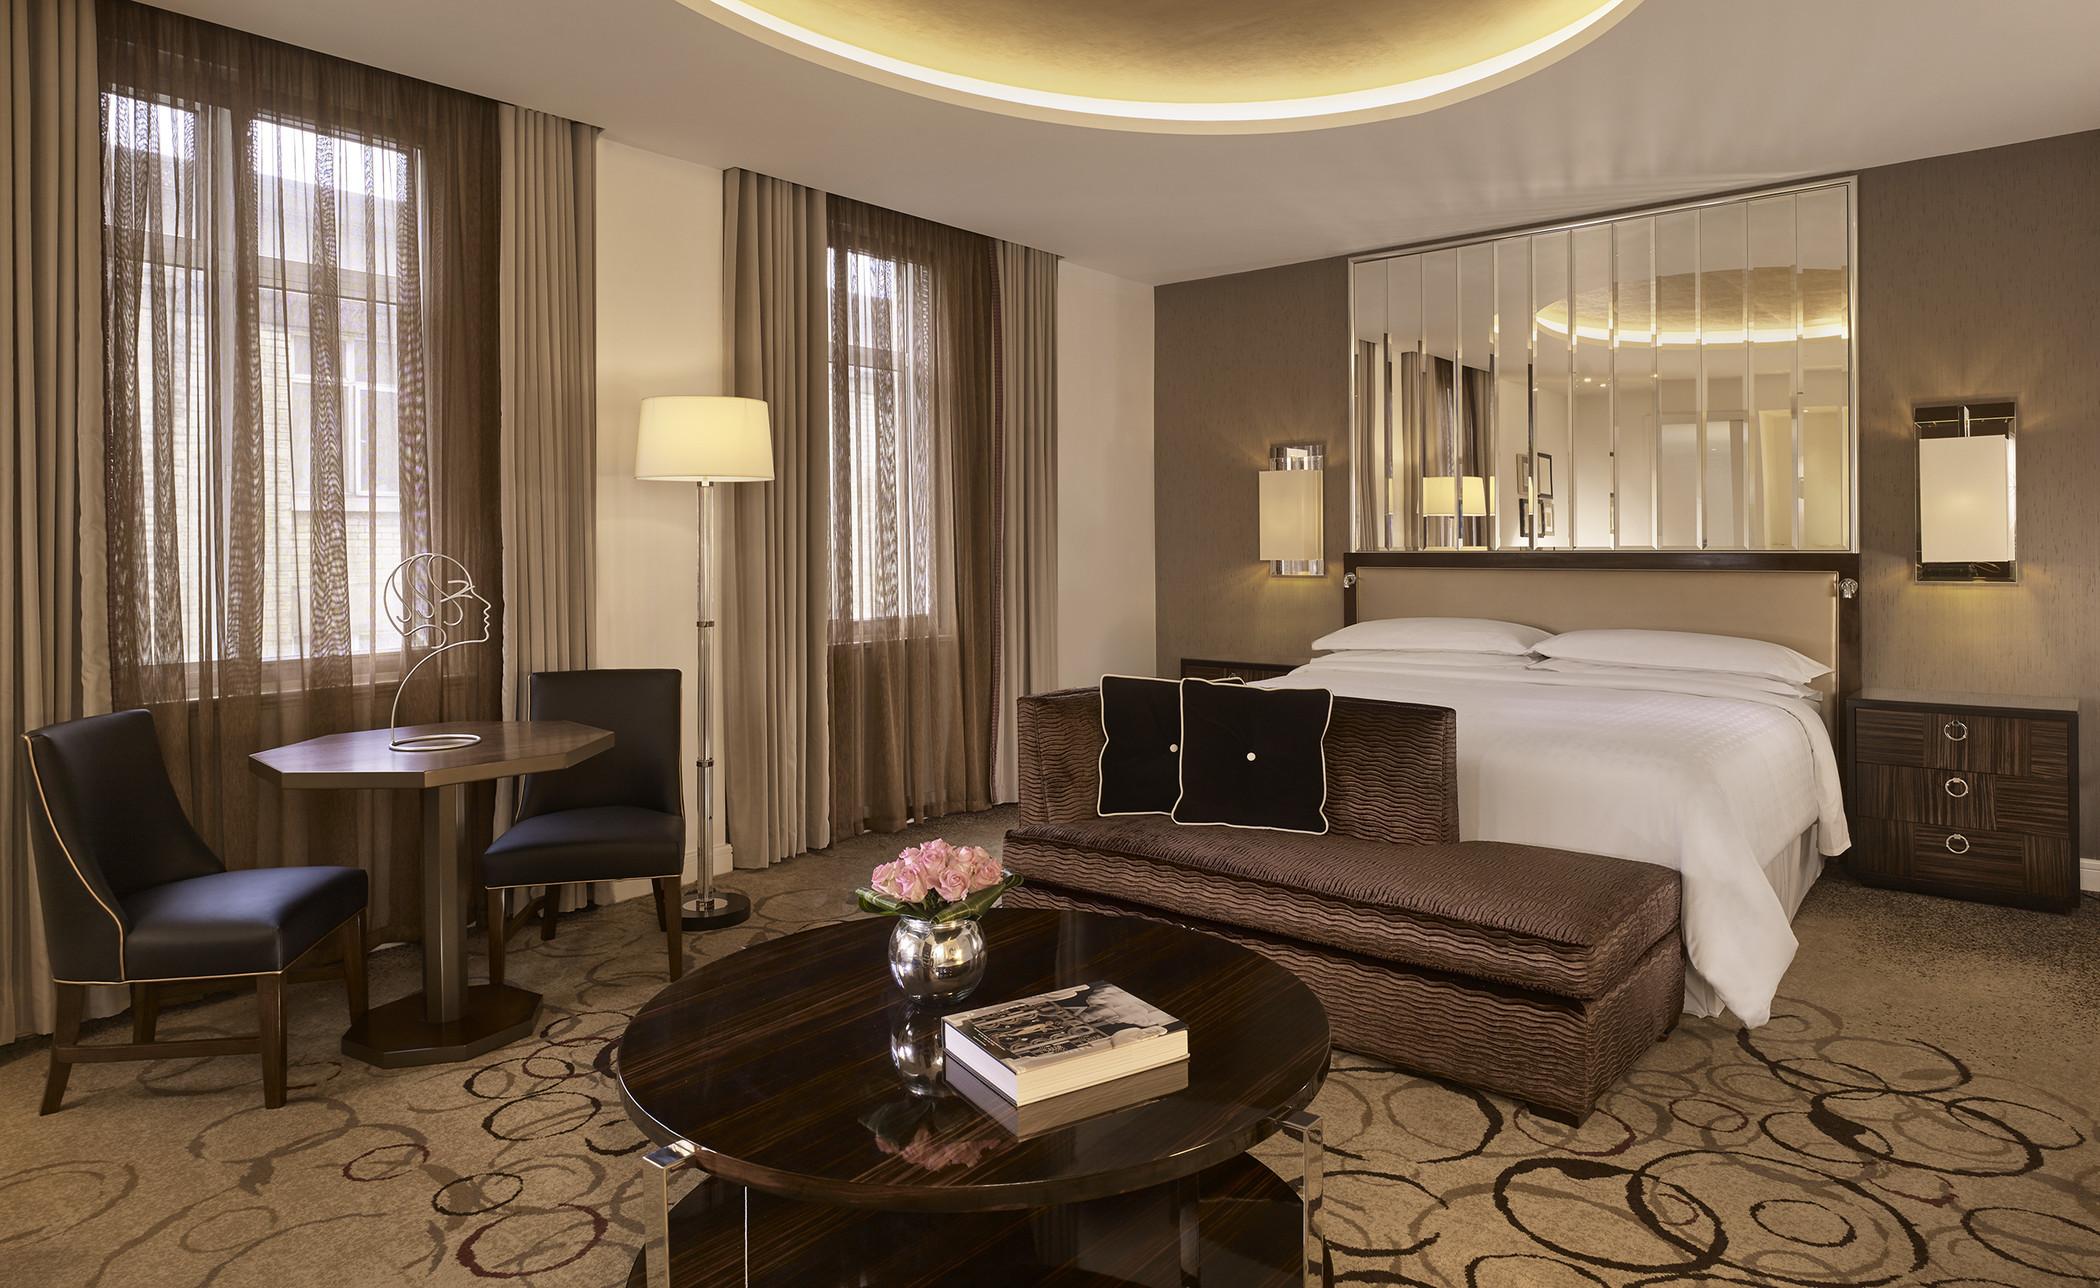 sheraton-hotel-resorts-sheraton-grand-london-park-lane-art-deco-suite-photo-business-wire